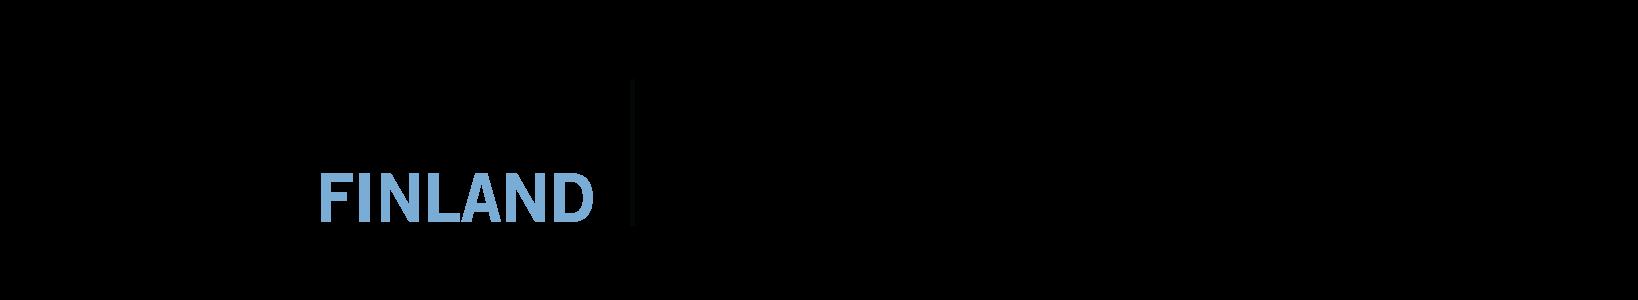 Blanchard-Finland-Logo-and-Tagline-Black-300dpi